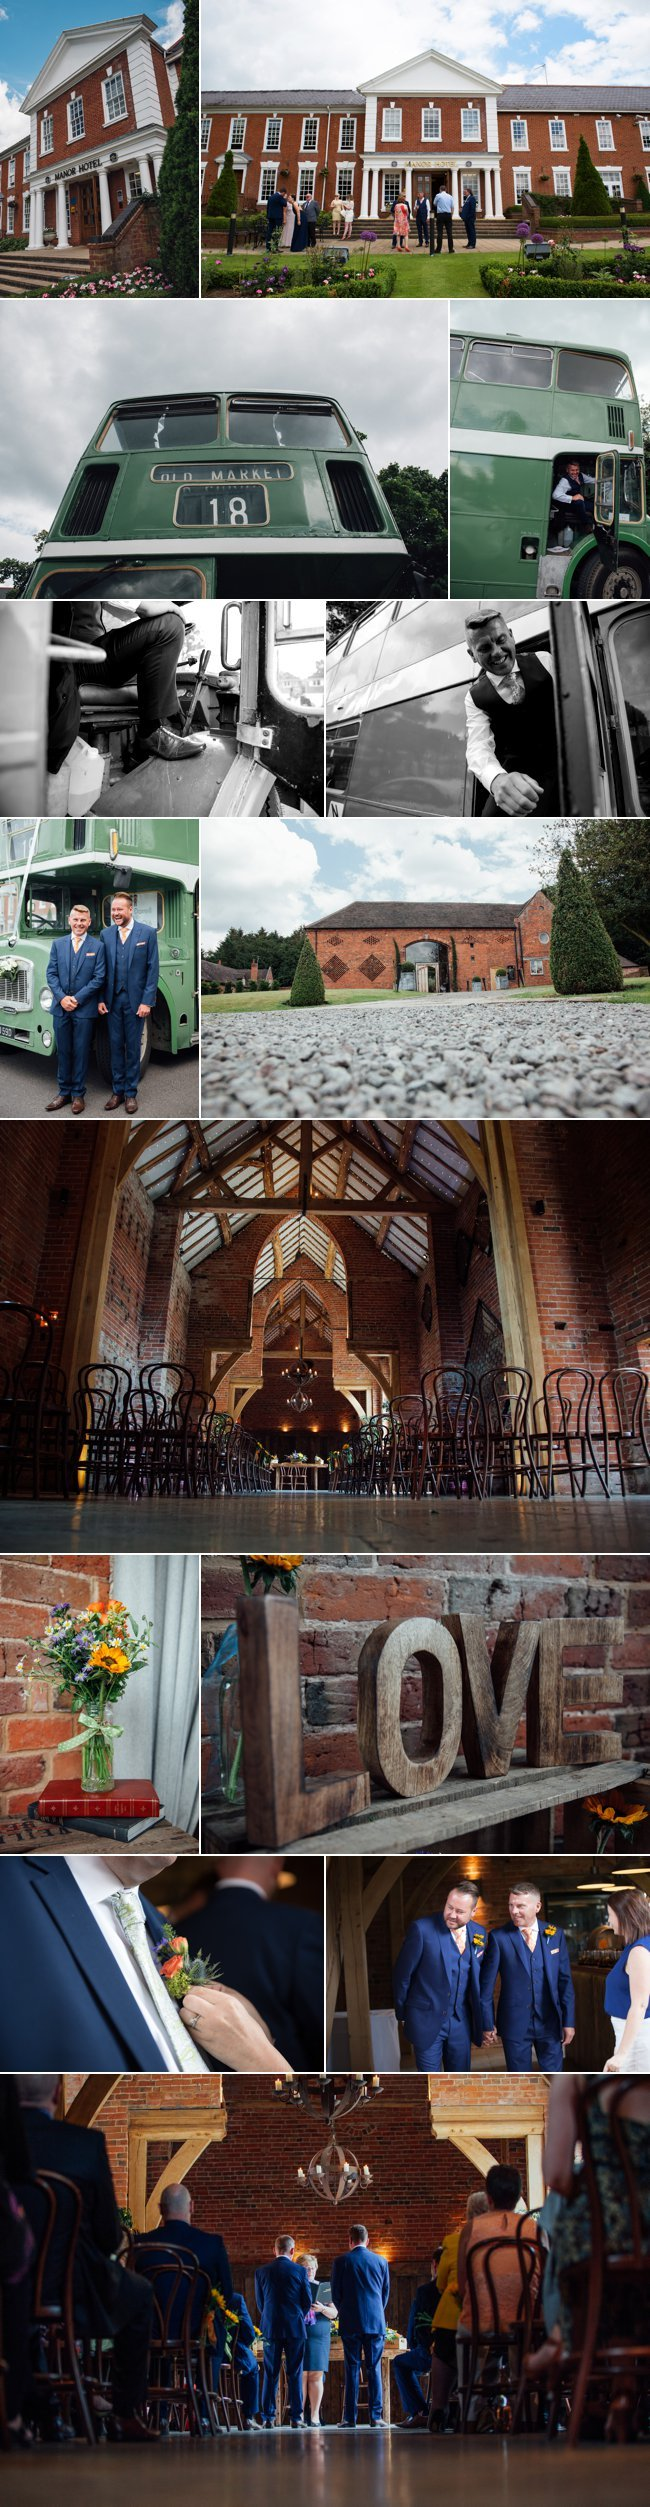 wedding photography at shutsoke barns